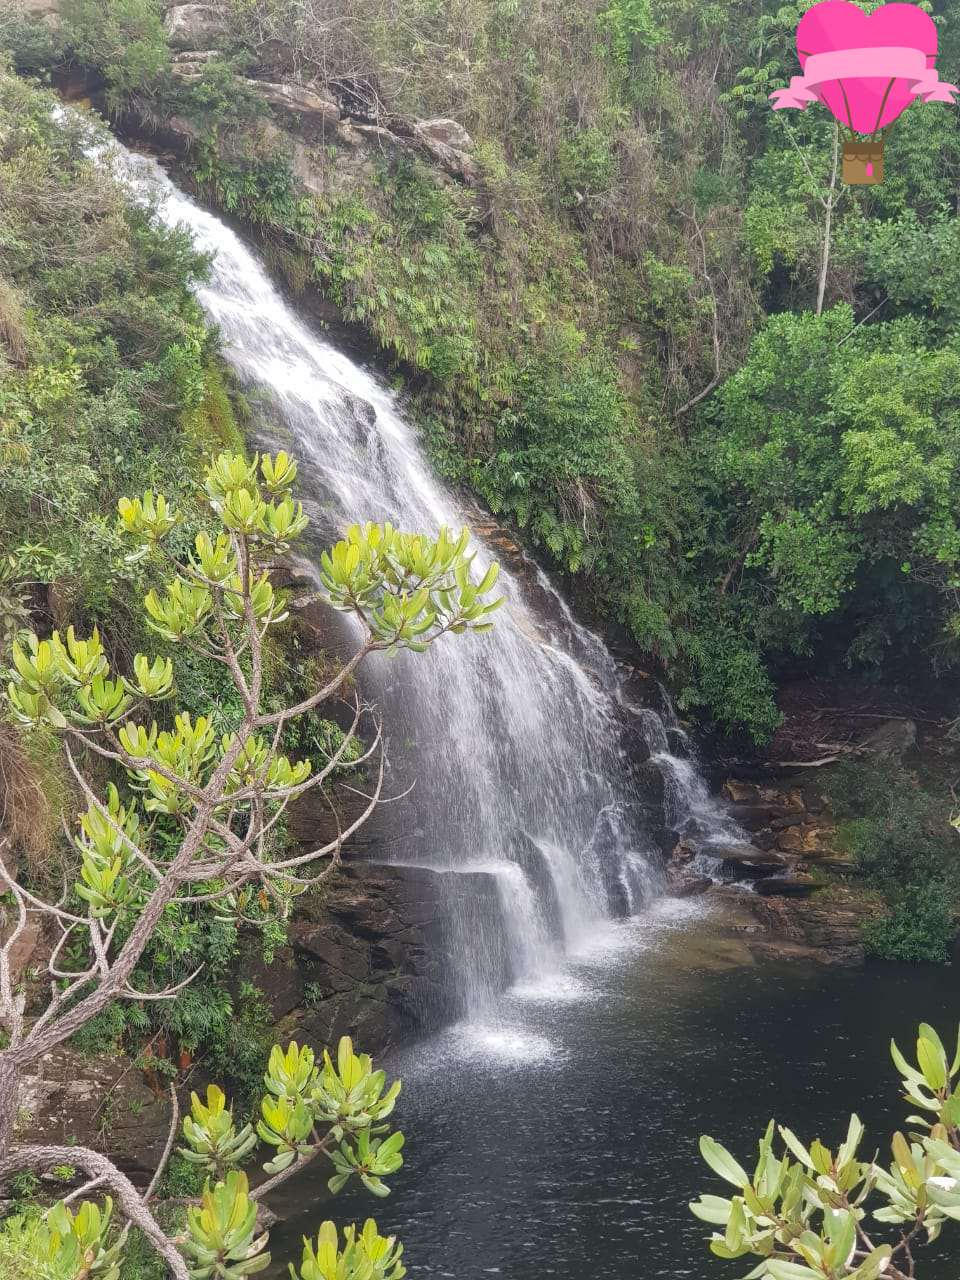 cachoeira-caverna-serra-cipo-petfriendly-bh